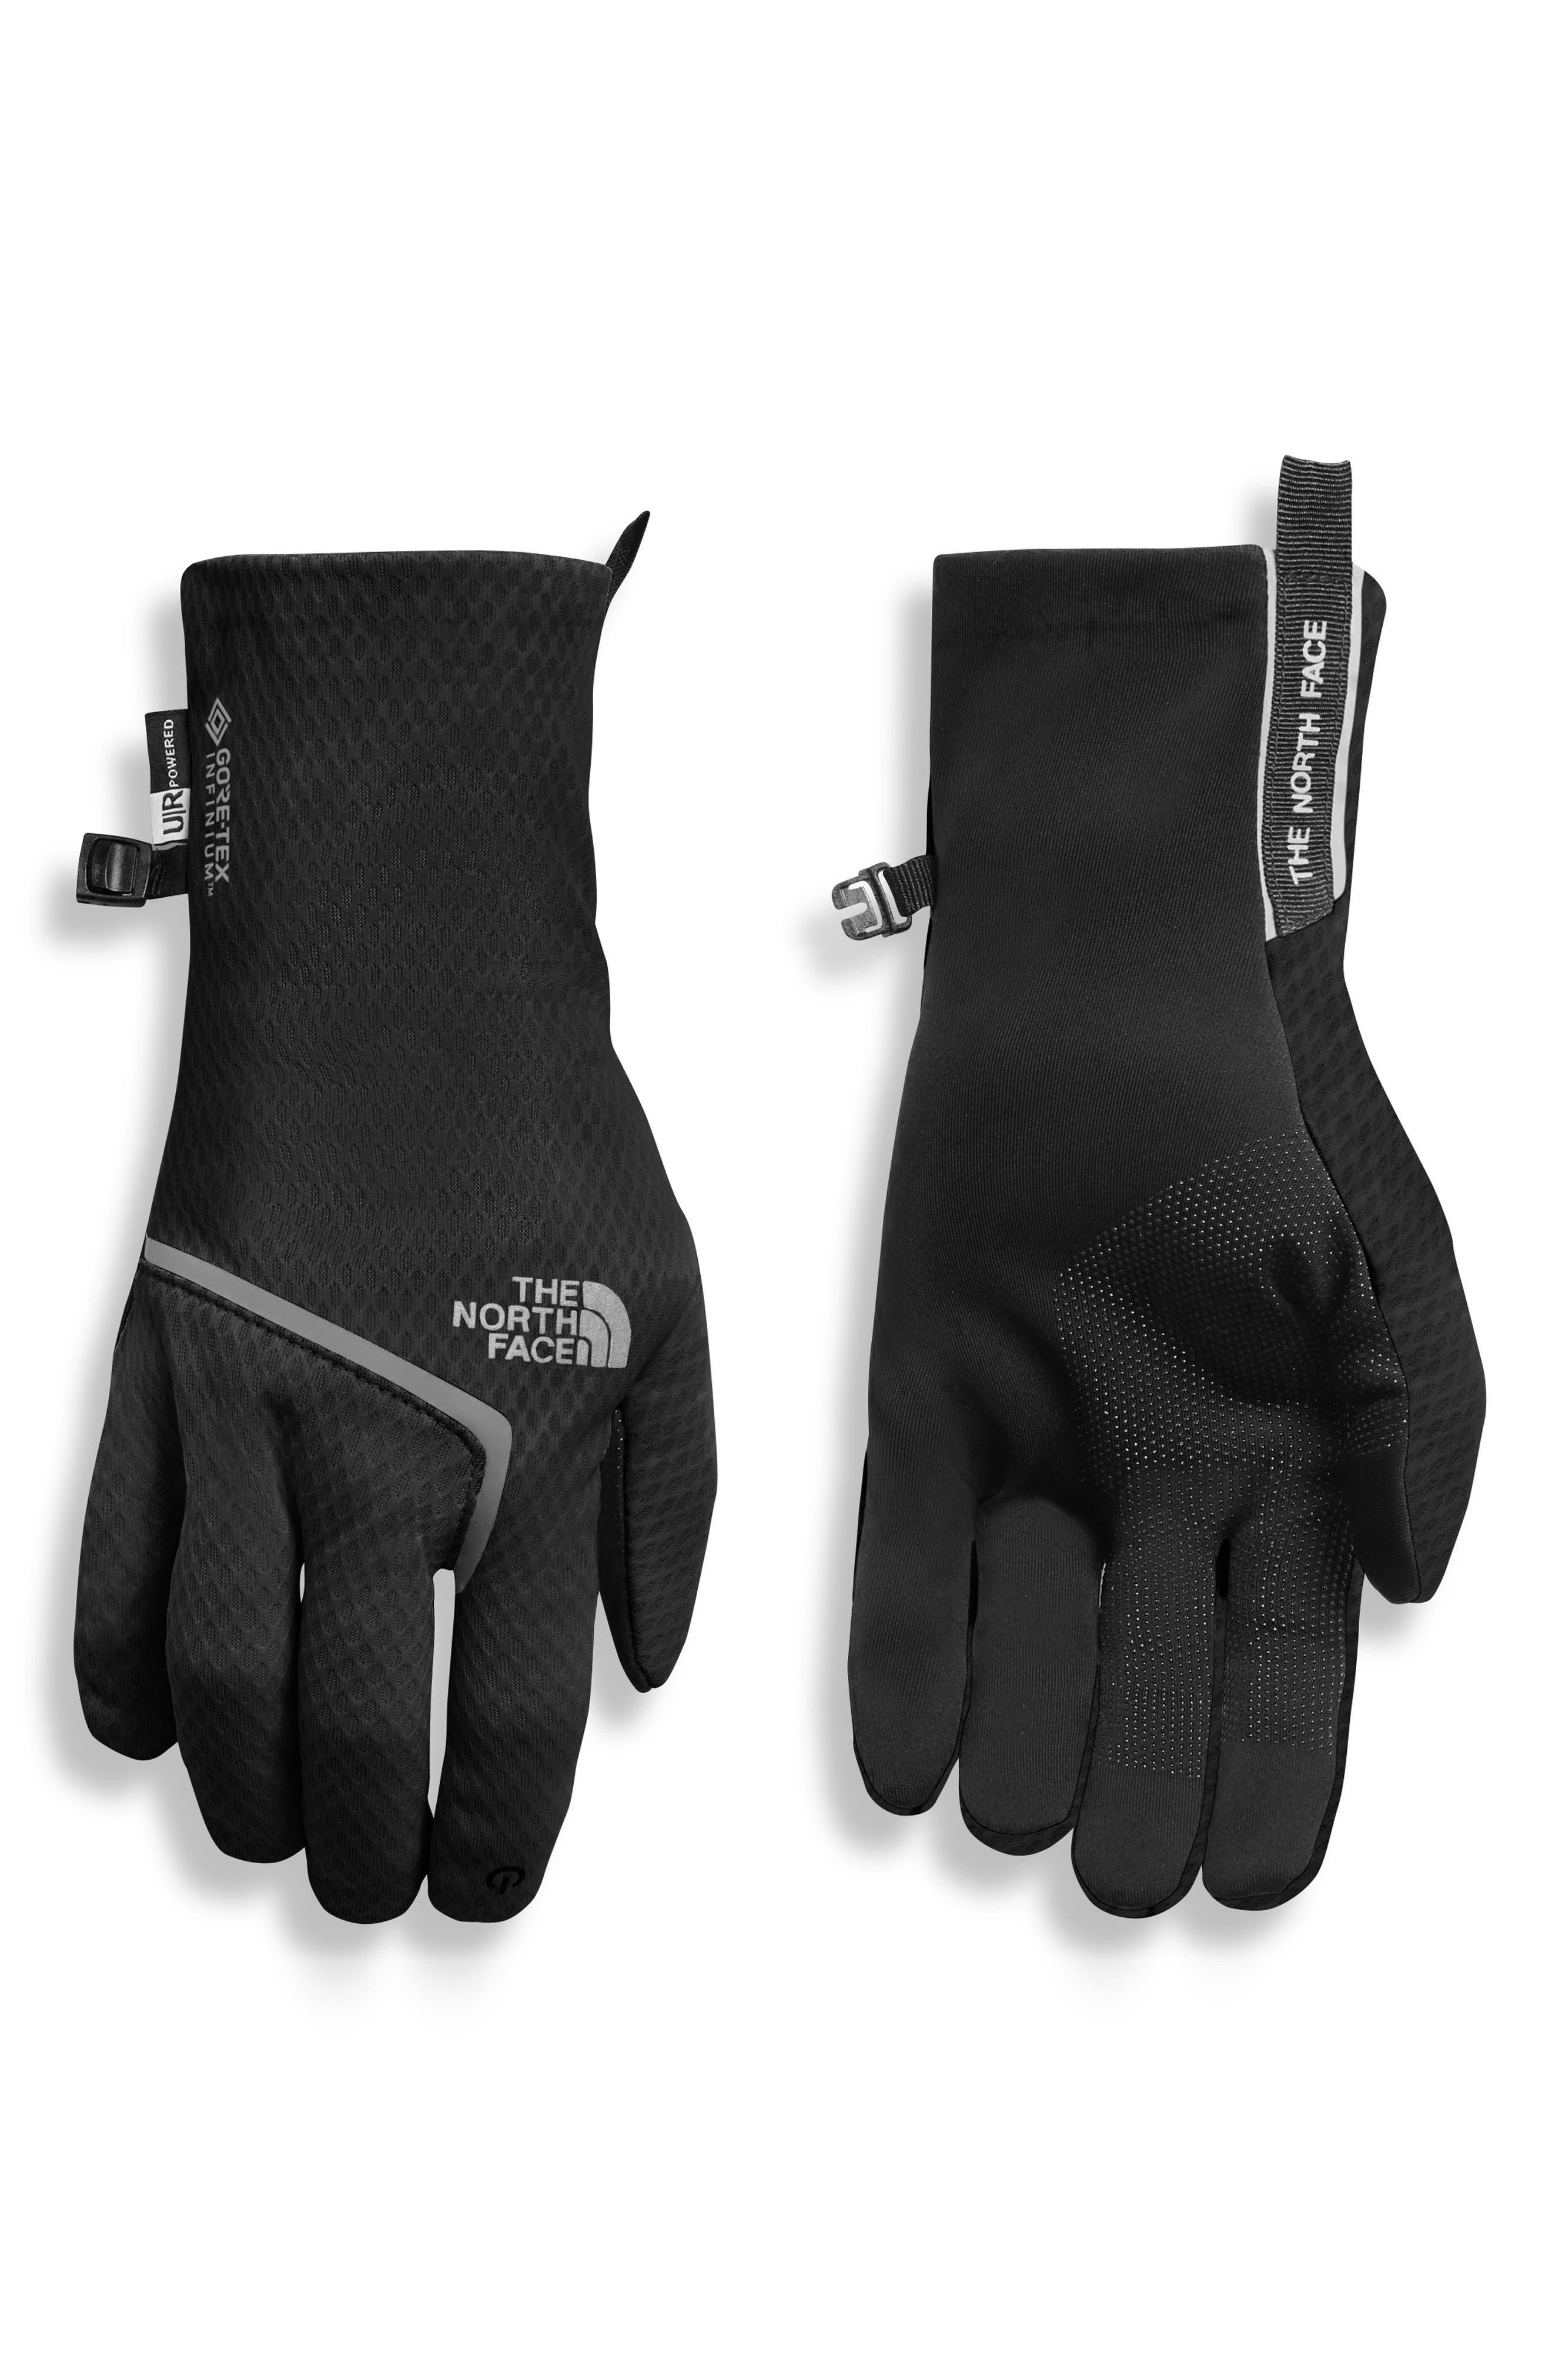 CloseFit Tricot Gloves,                             Main thumbnail 1, color,                             TNF BLACK